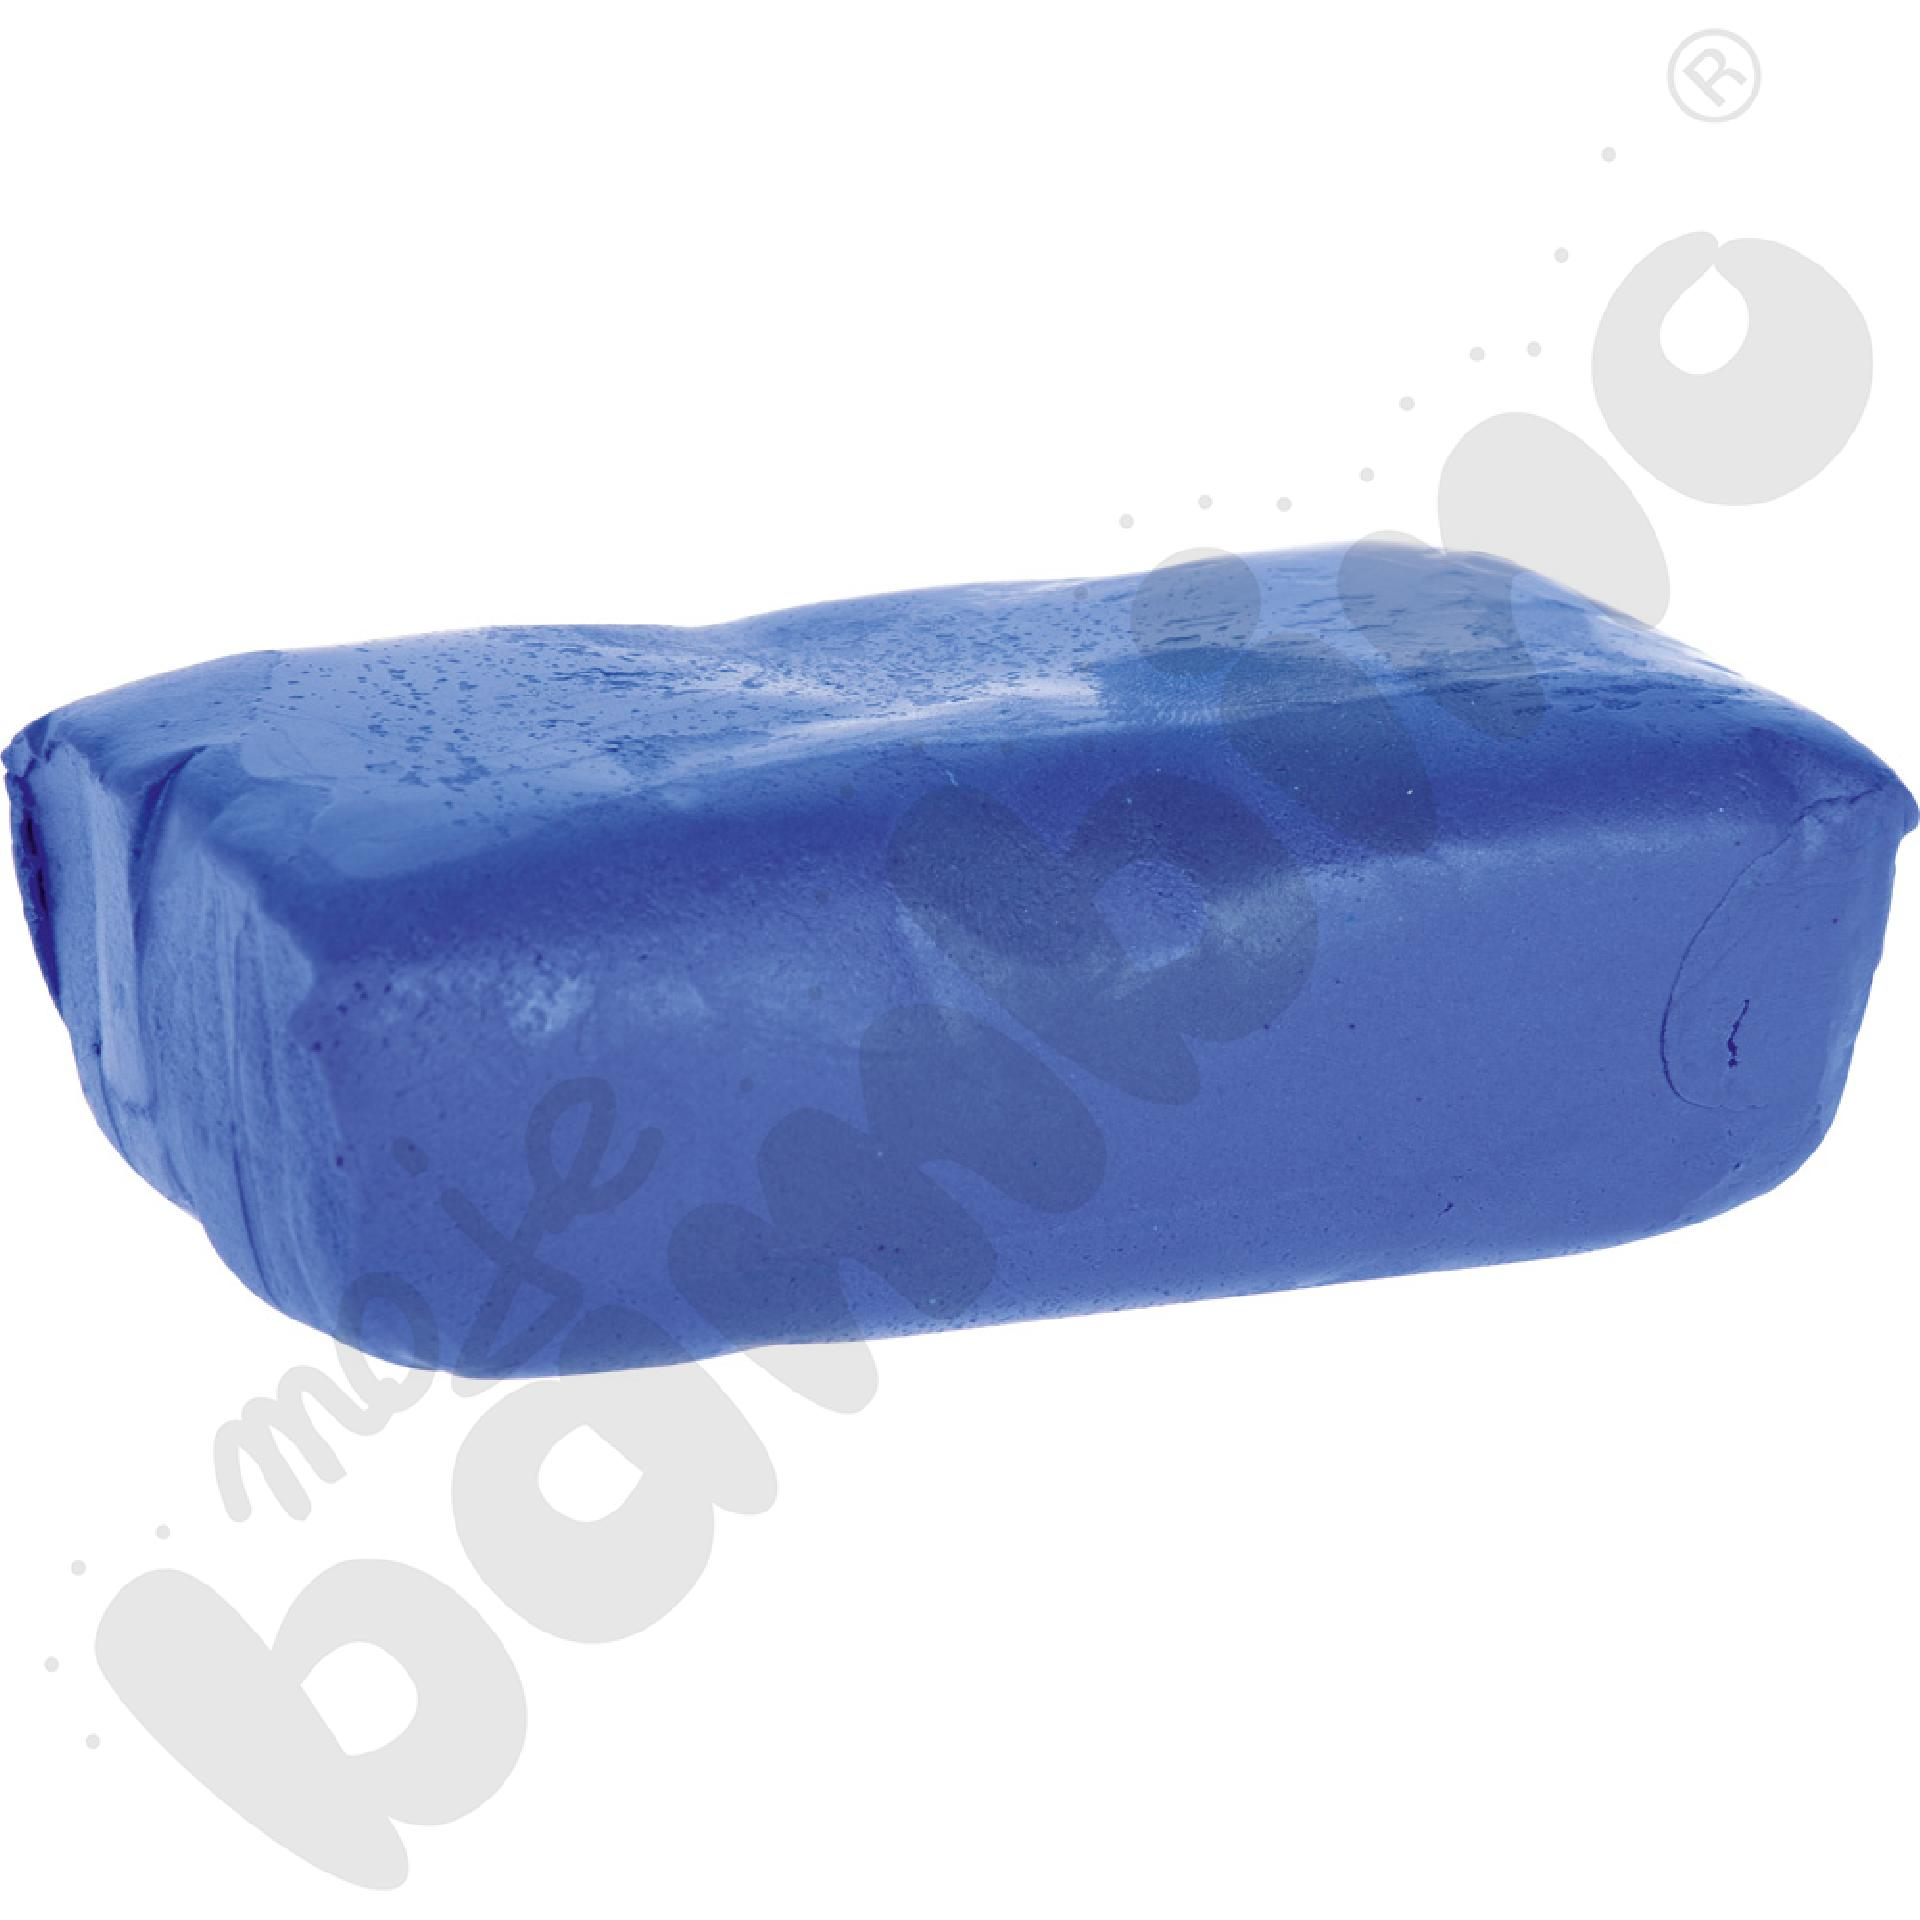 Glinka modelarska - niebieska